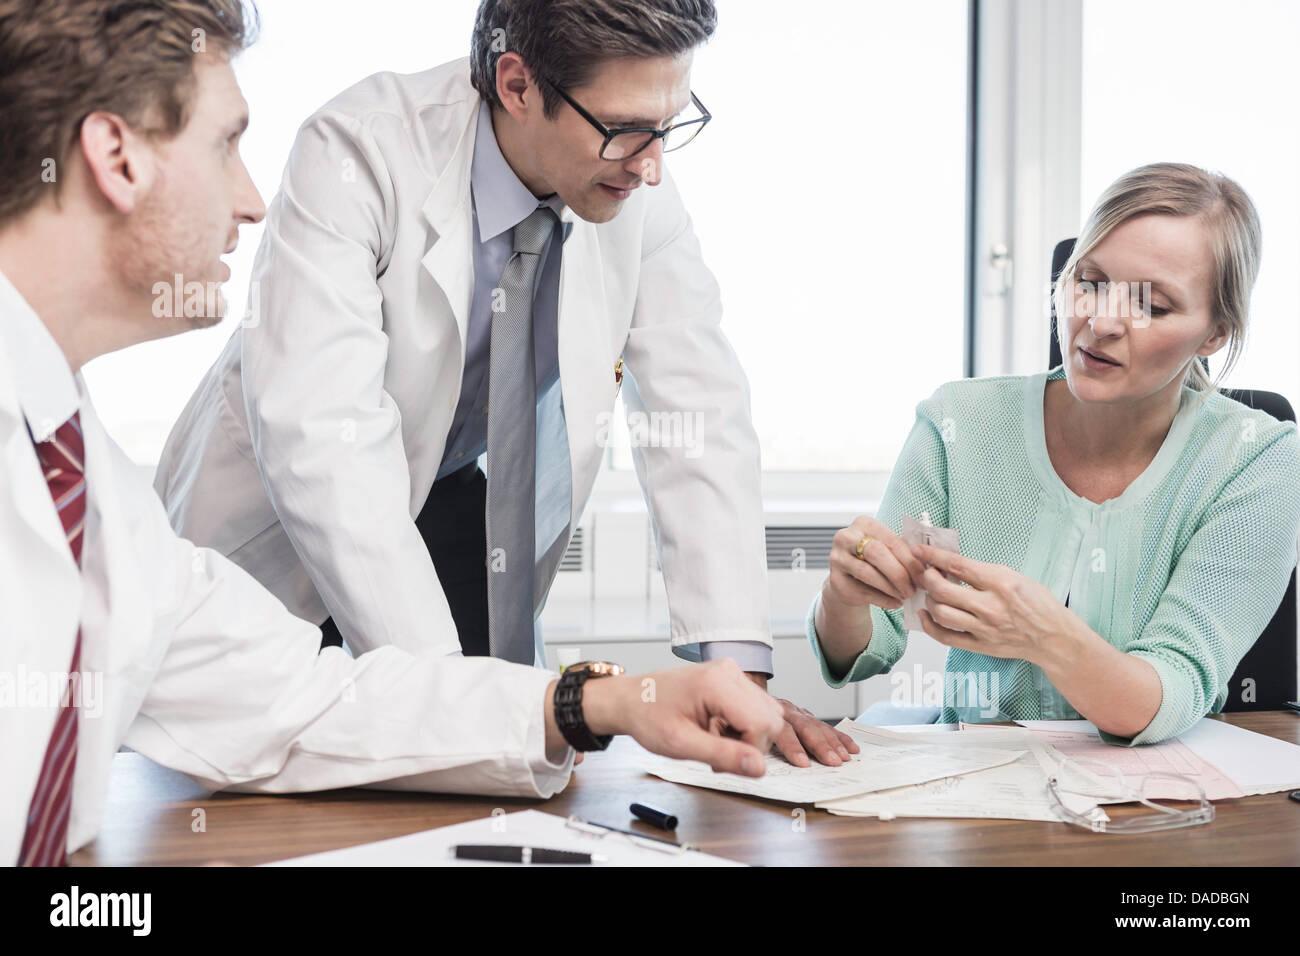 Men wearing lab coats speaking to woman sat at desk holding test tube - Stock Image